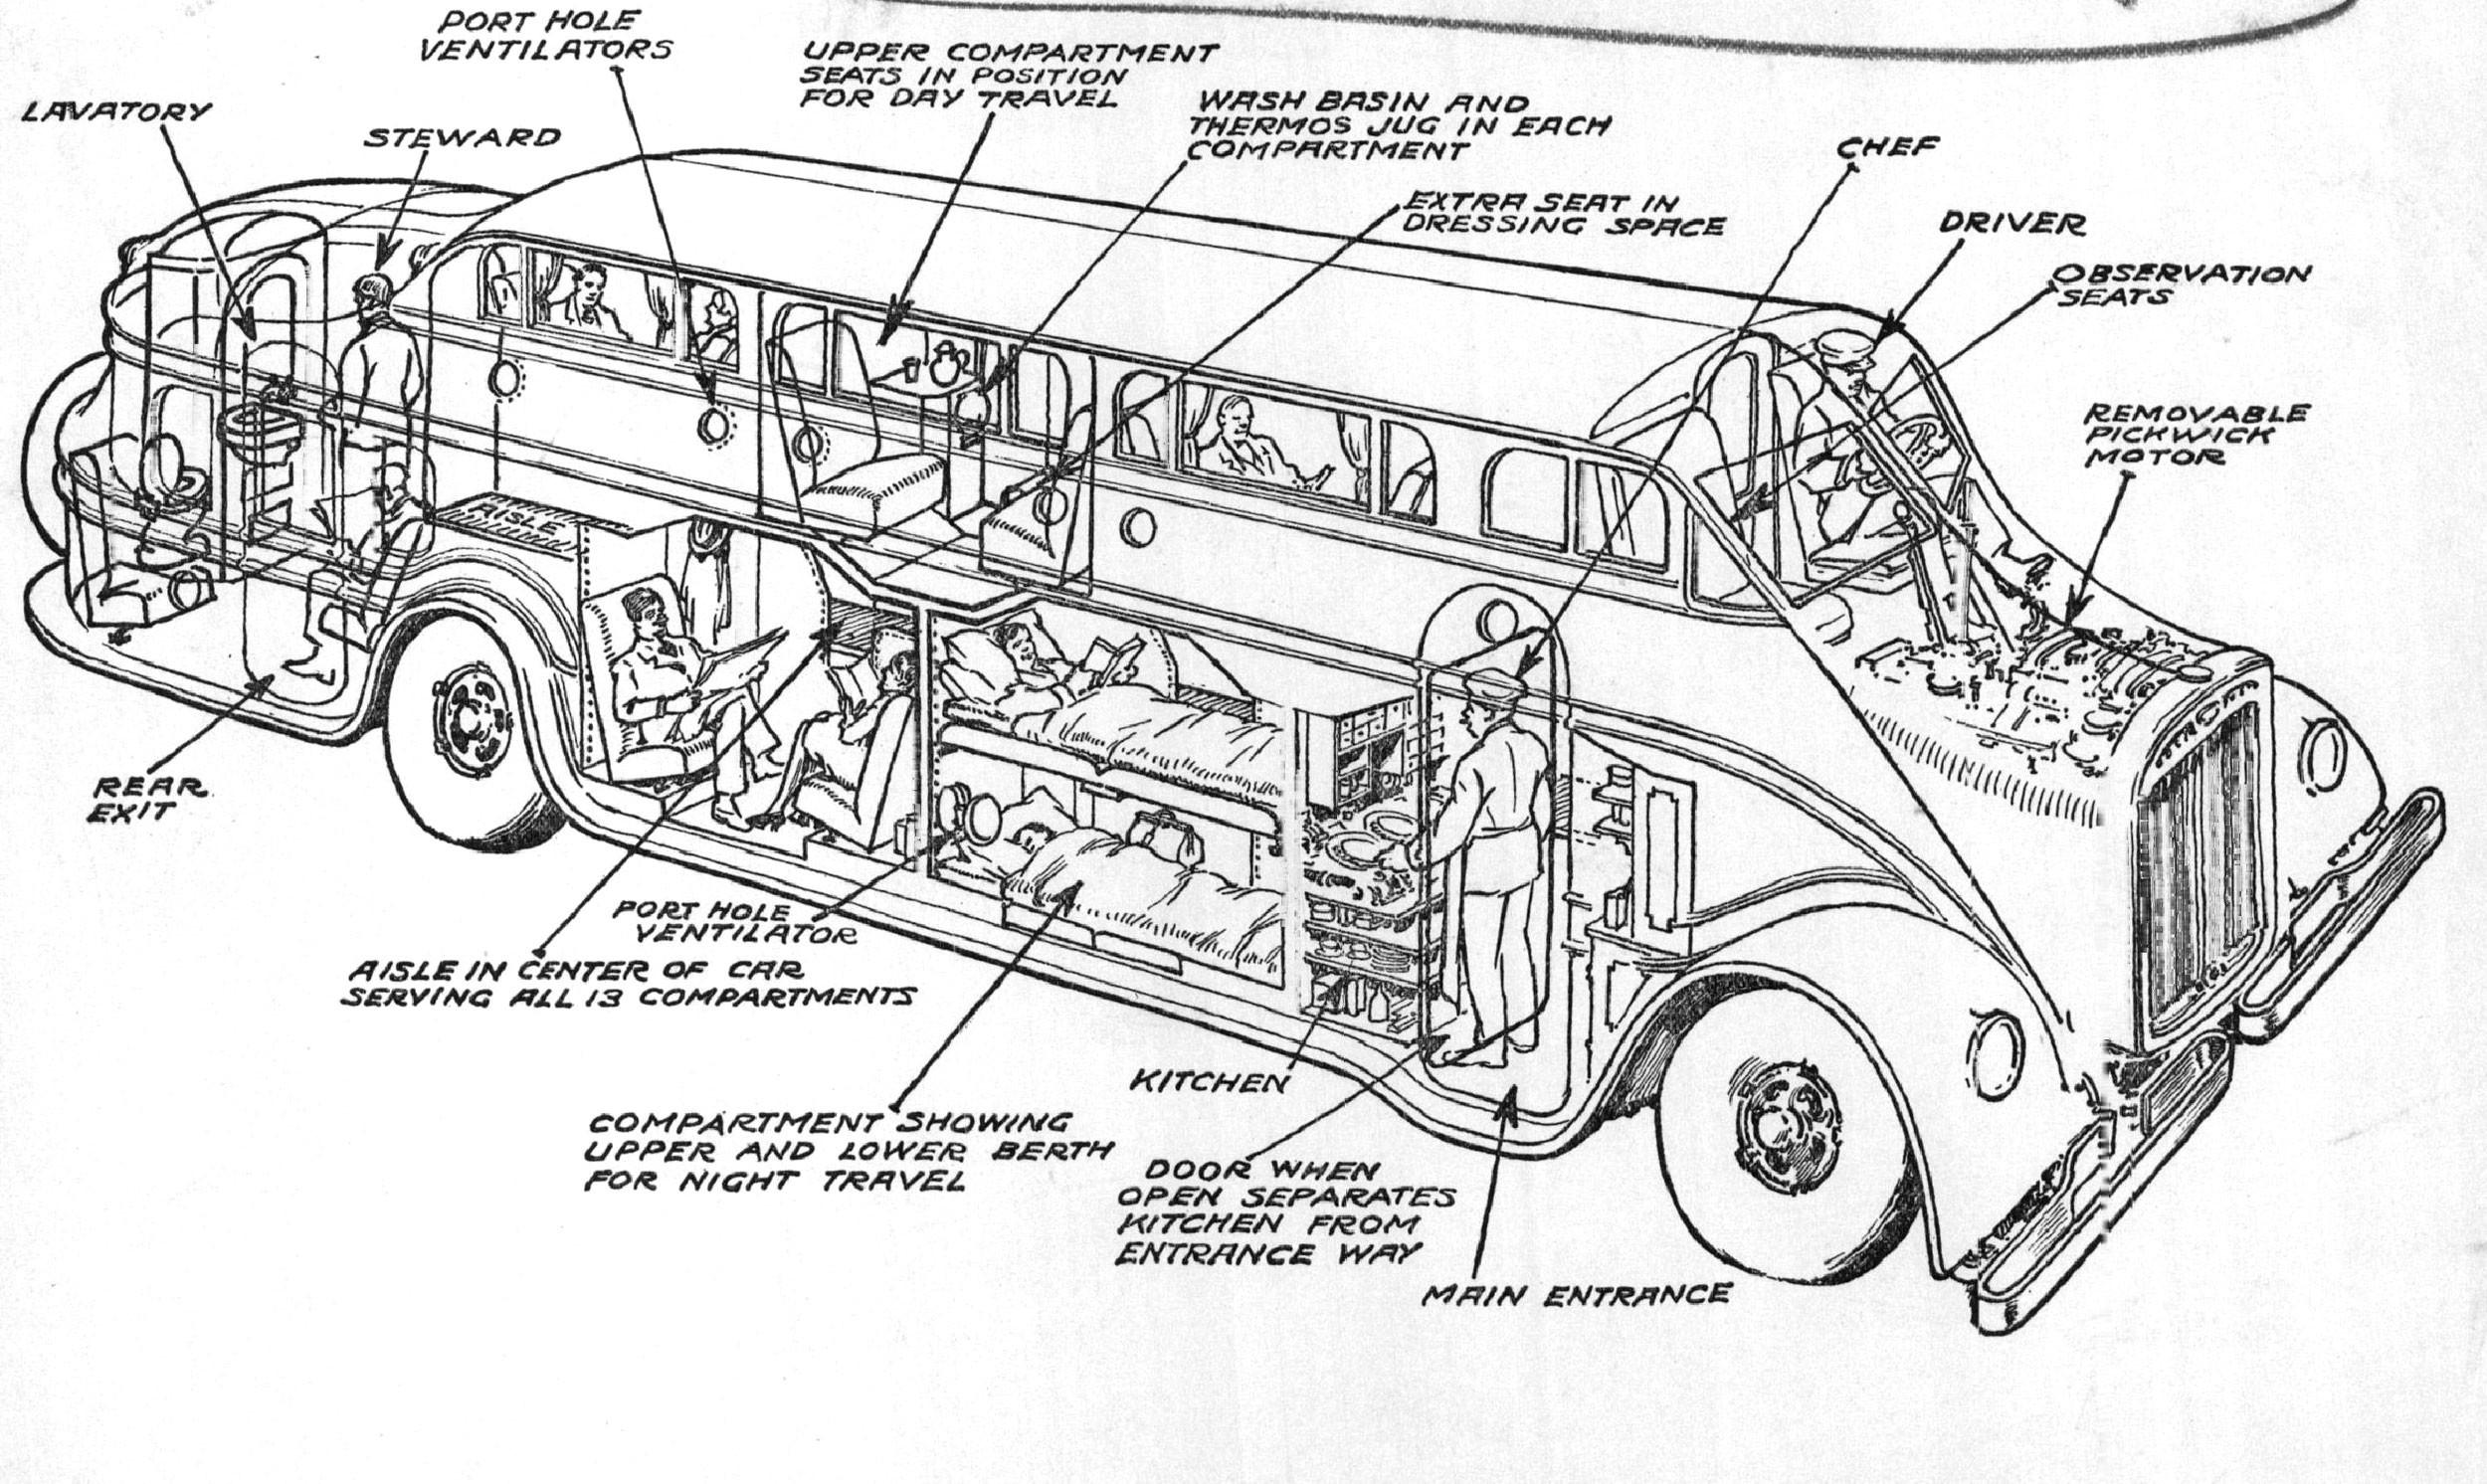 Names Of Car Parts Diagram Car Diagram Fantastic Car Part Diagrams Image Ideas Car Part Of Names Of Car Parts Diagram